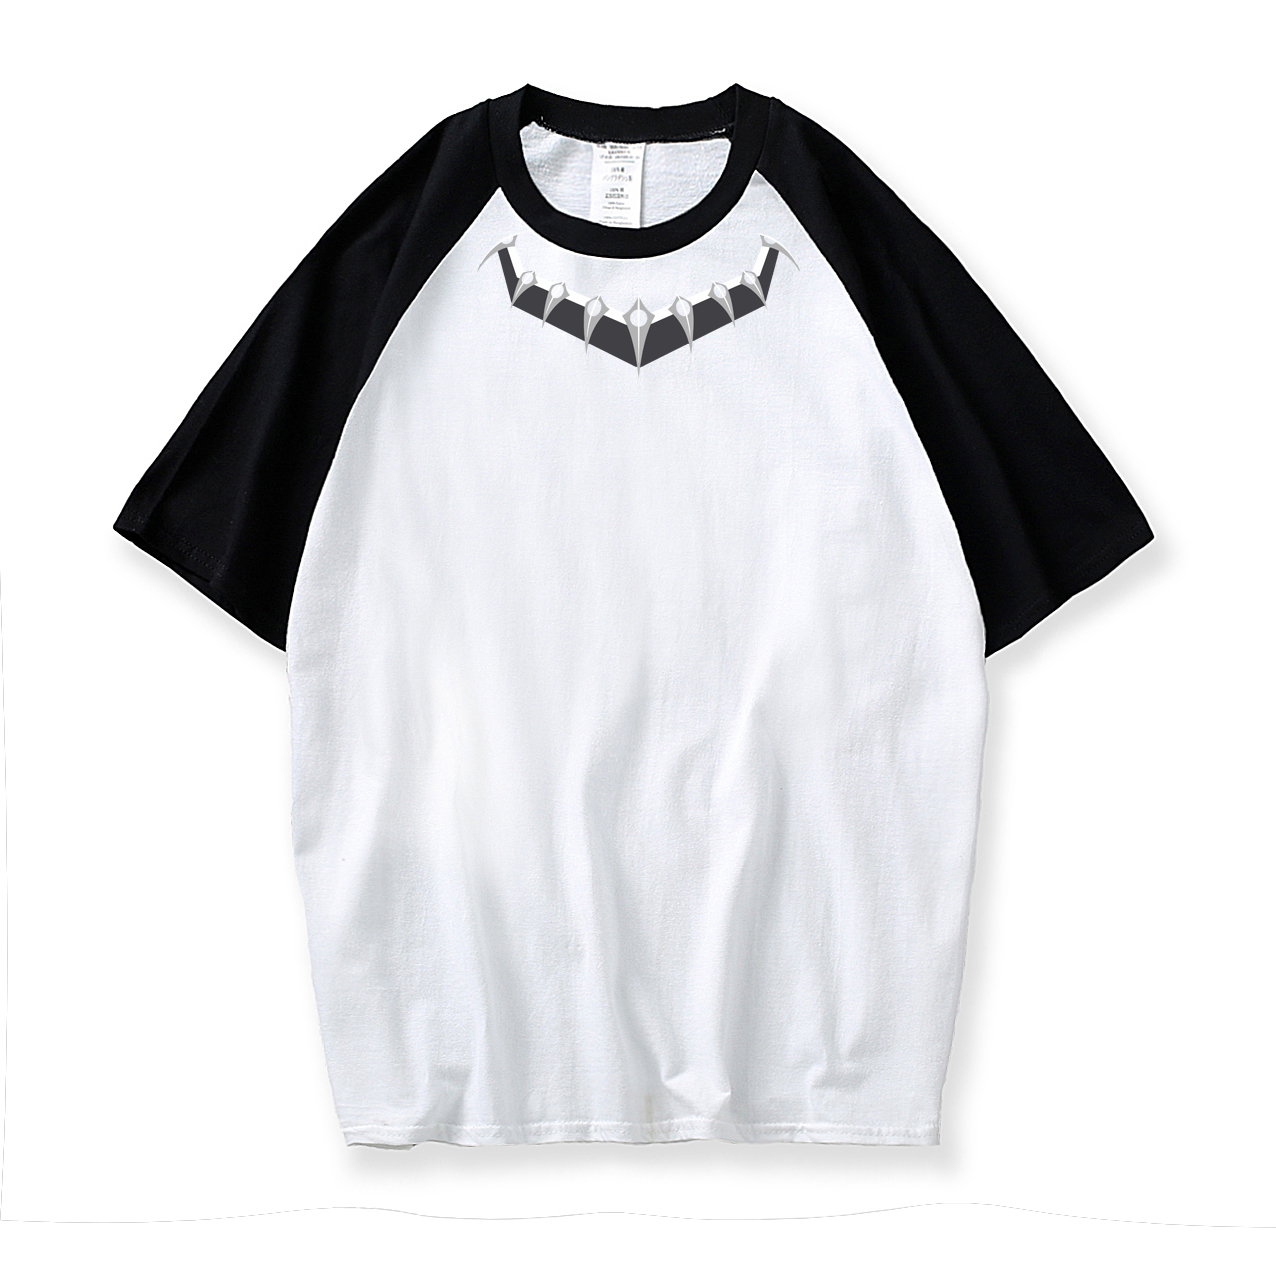 raglan short sleeve t shirt o-neck cotton camiseta Black Panther T-Shirt 2019 summer men harajuku streetwear top tee shirt homme